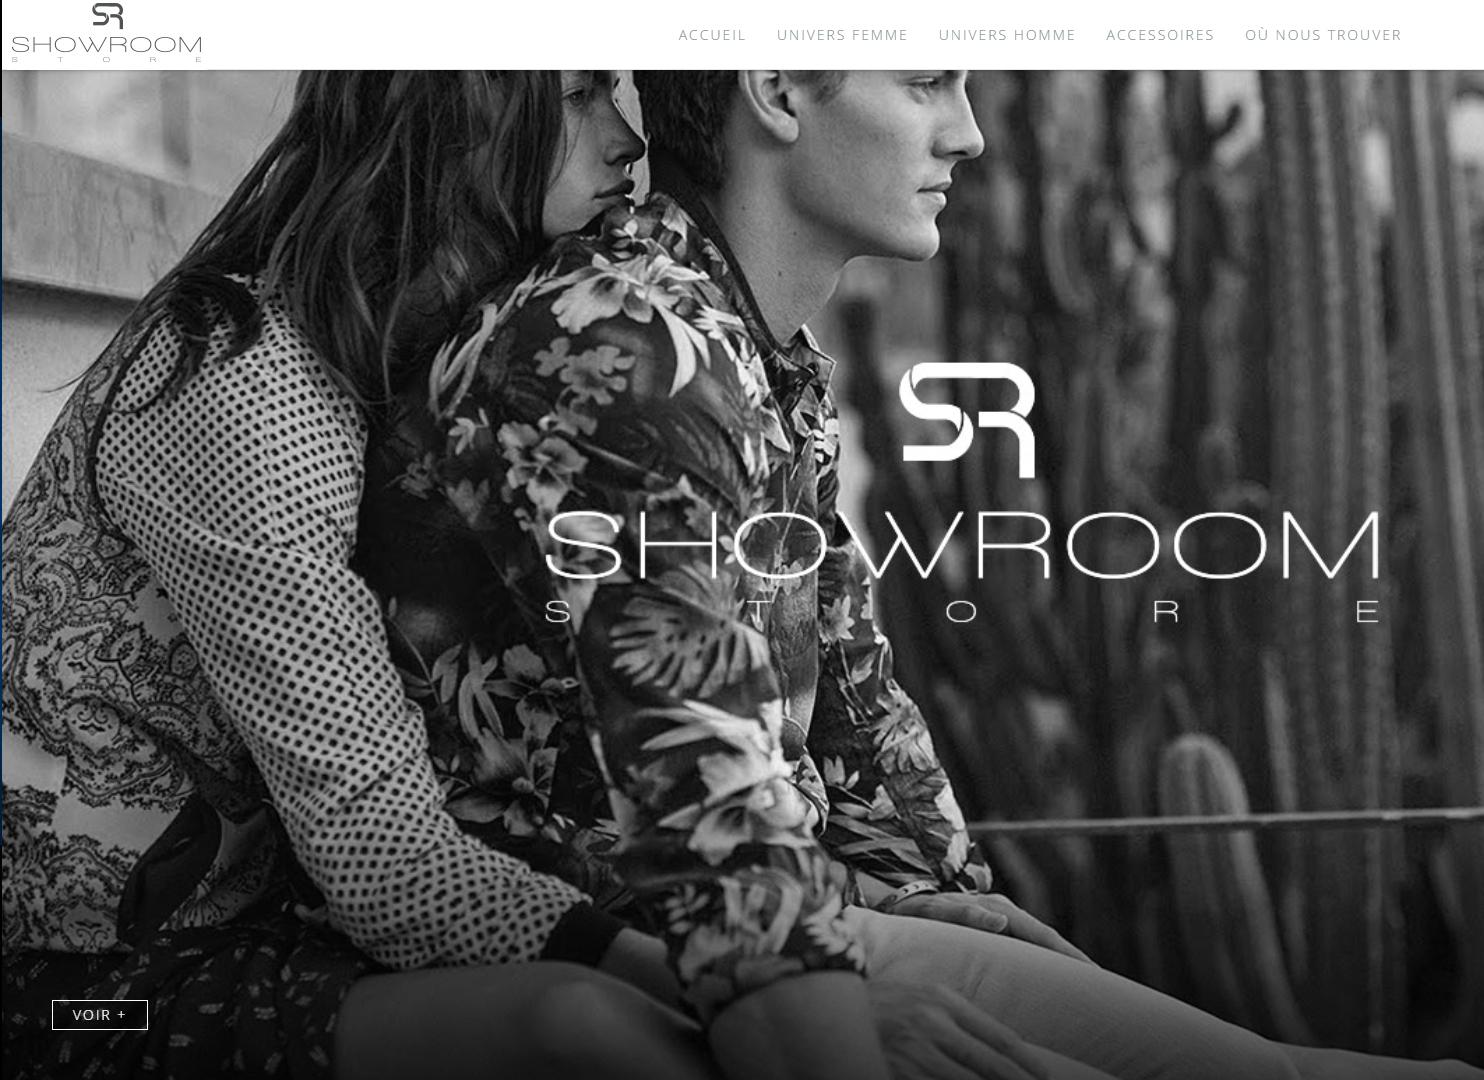 showroomstore